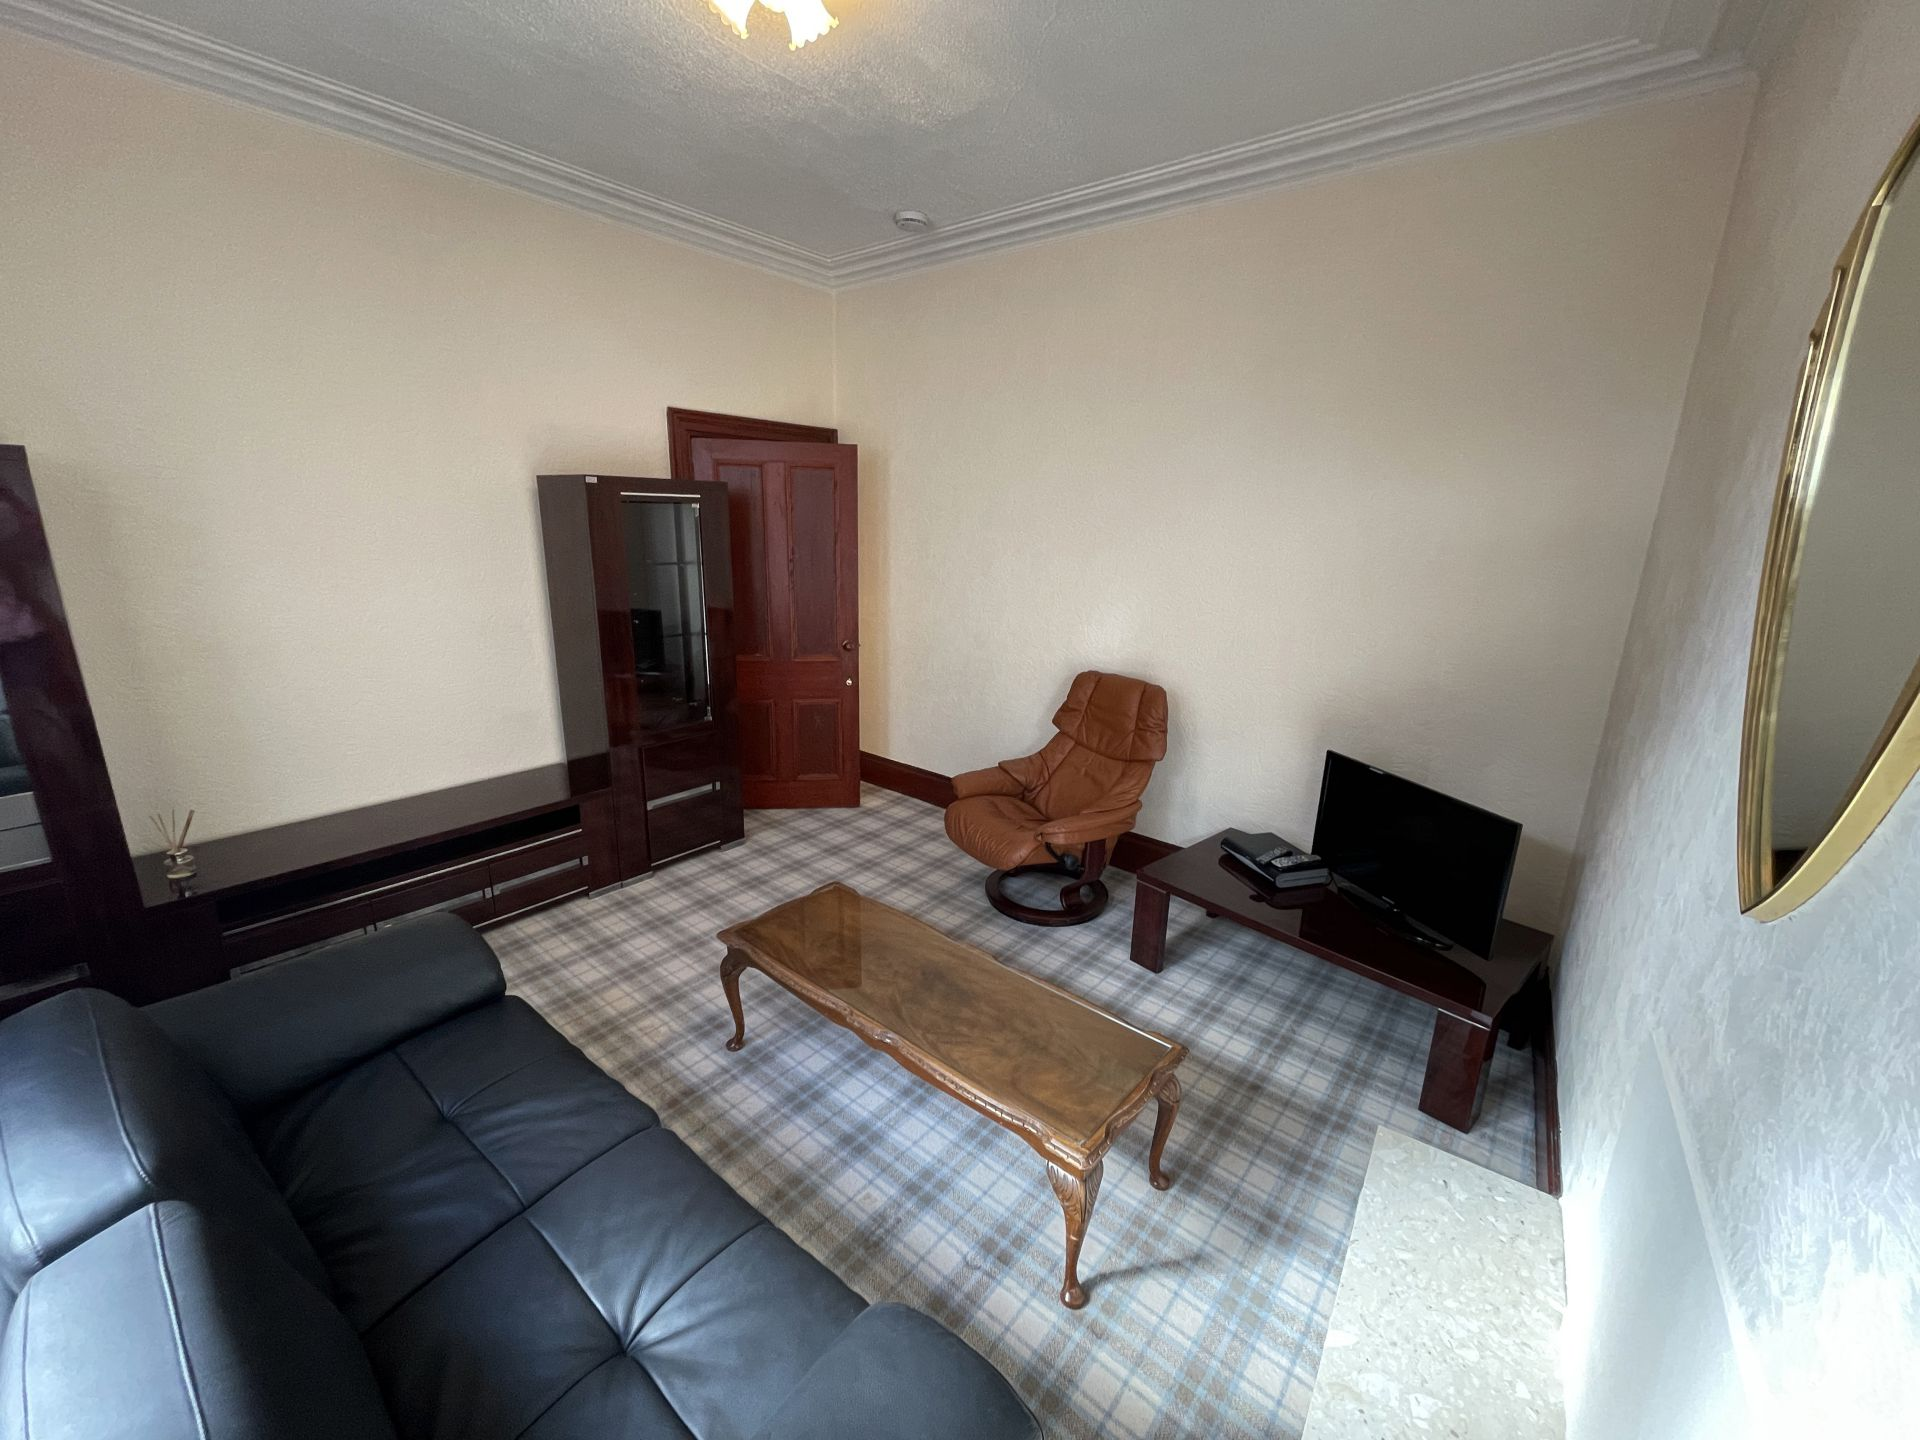 ARD-Properties-Development-Sites-Buy-Homes-Rent-Aberdeenshire-Rentals-2a-St-Andrew-Streeet-Peterhead-Banner (26)